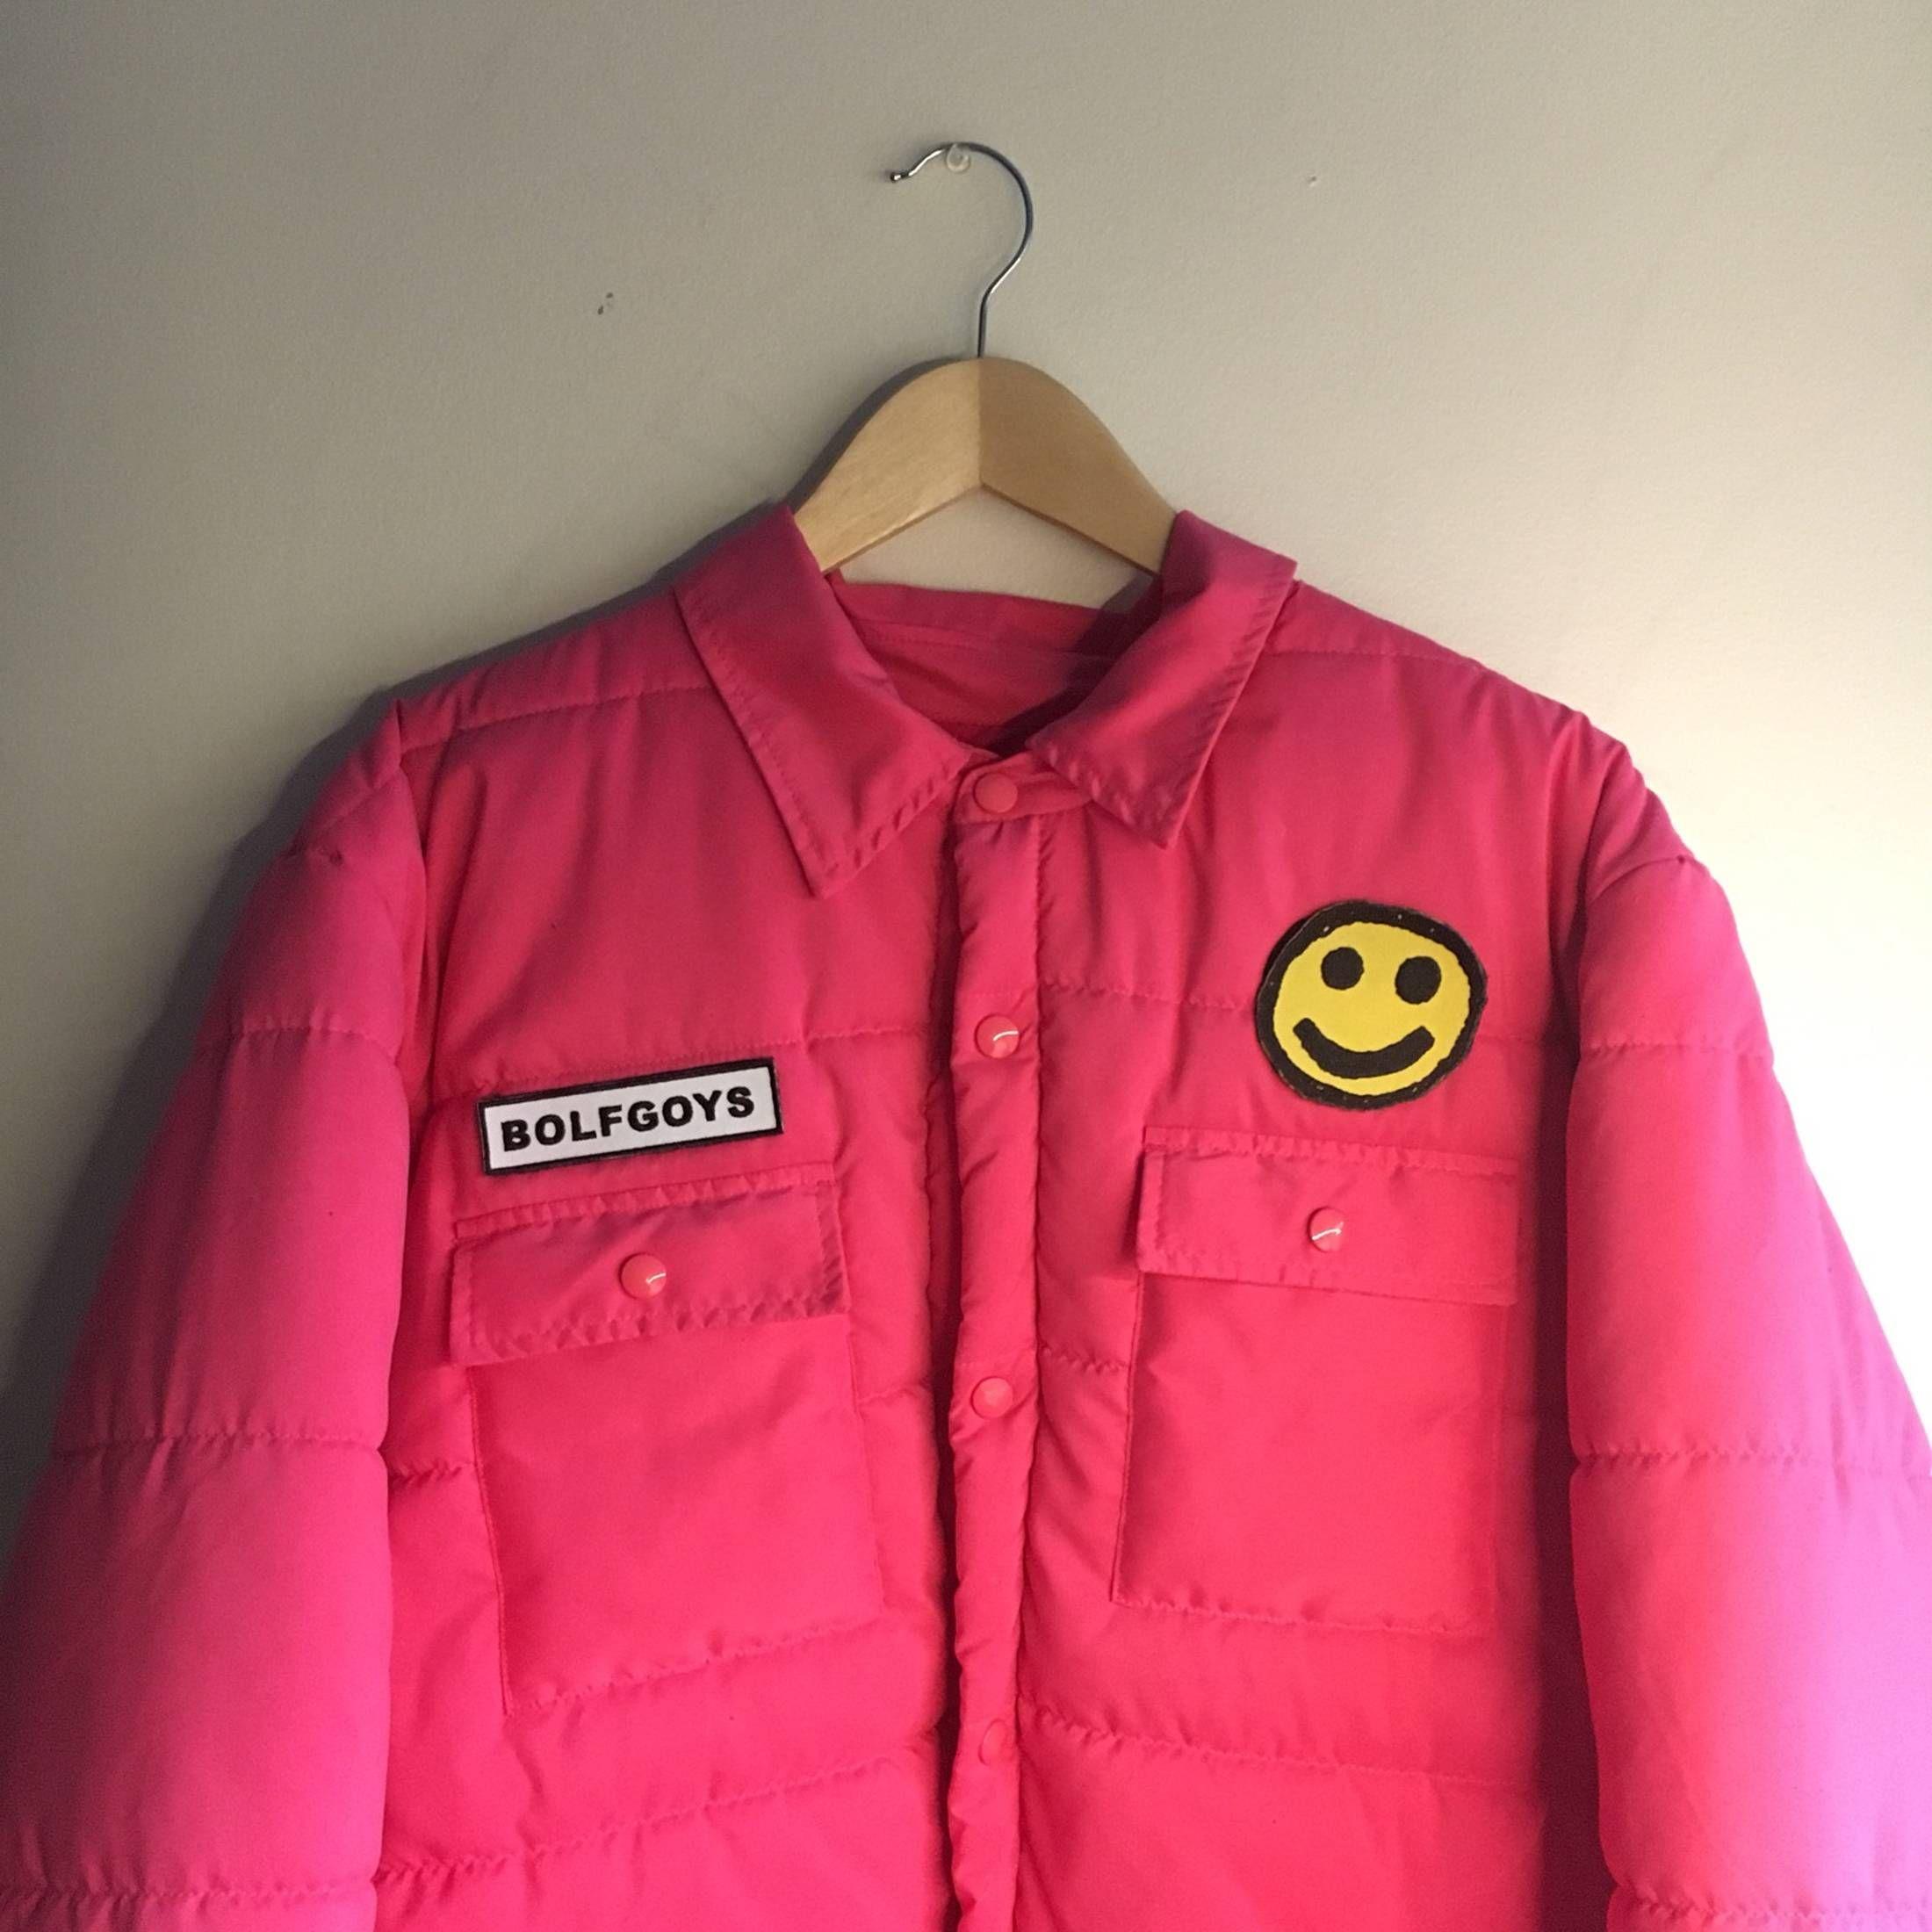 3fdaa0529fae Golf Wang Pink Bolf Goys Puffer Jacket Size US XL   EU 56   4 ...